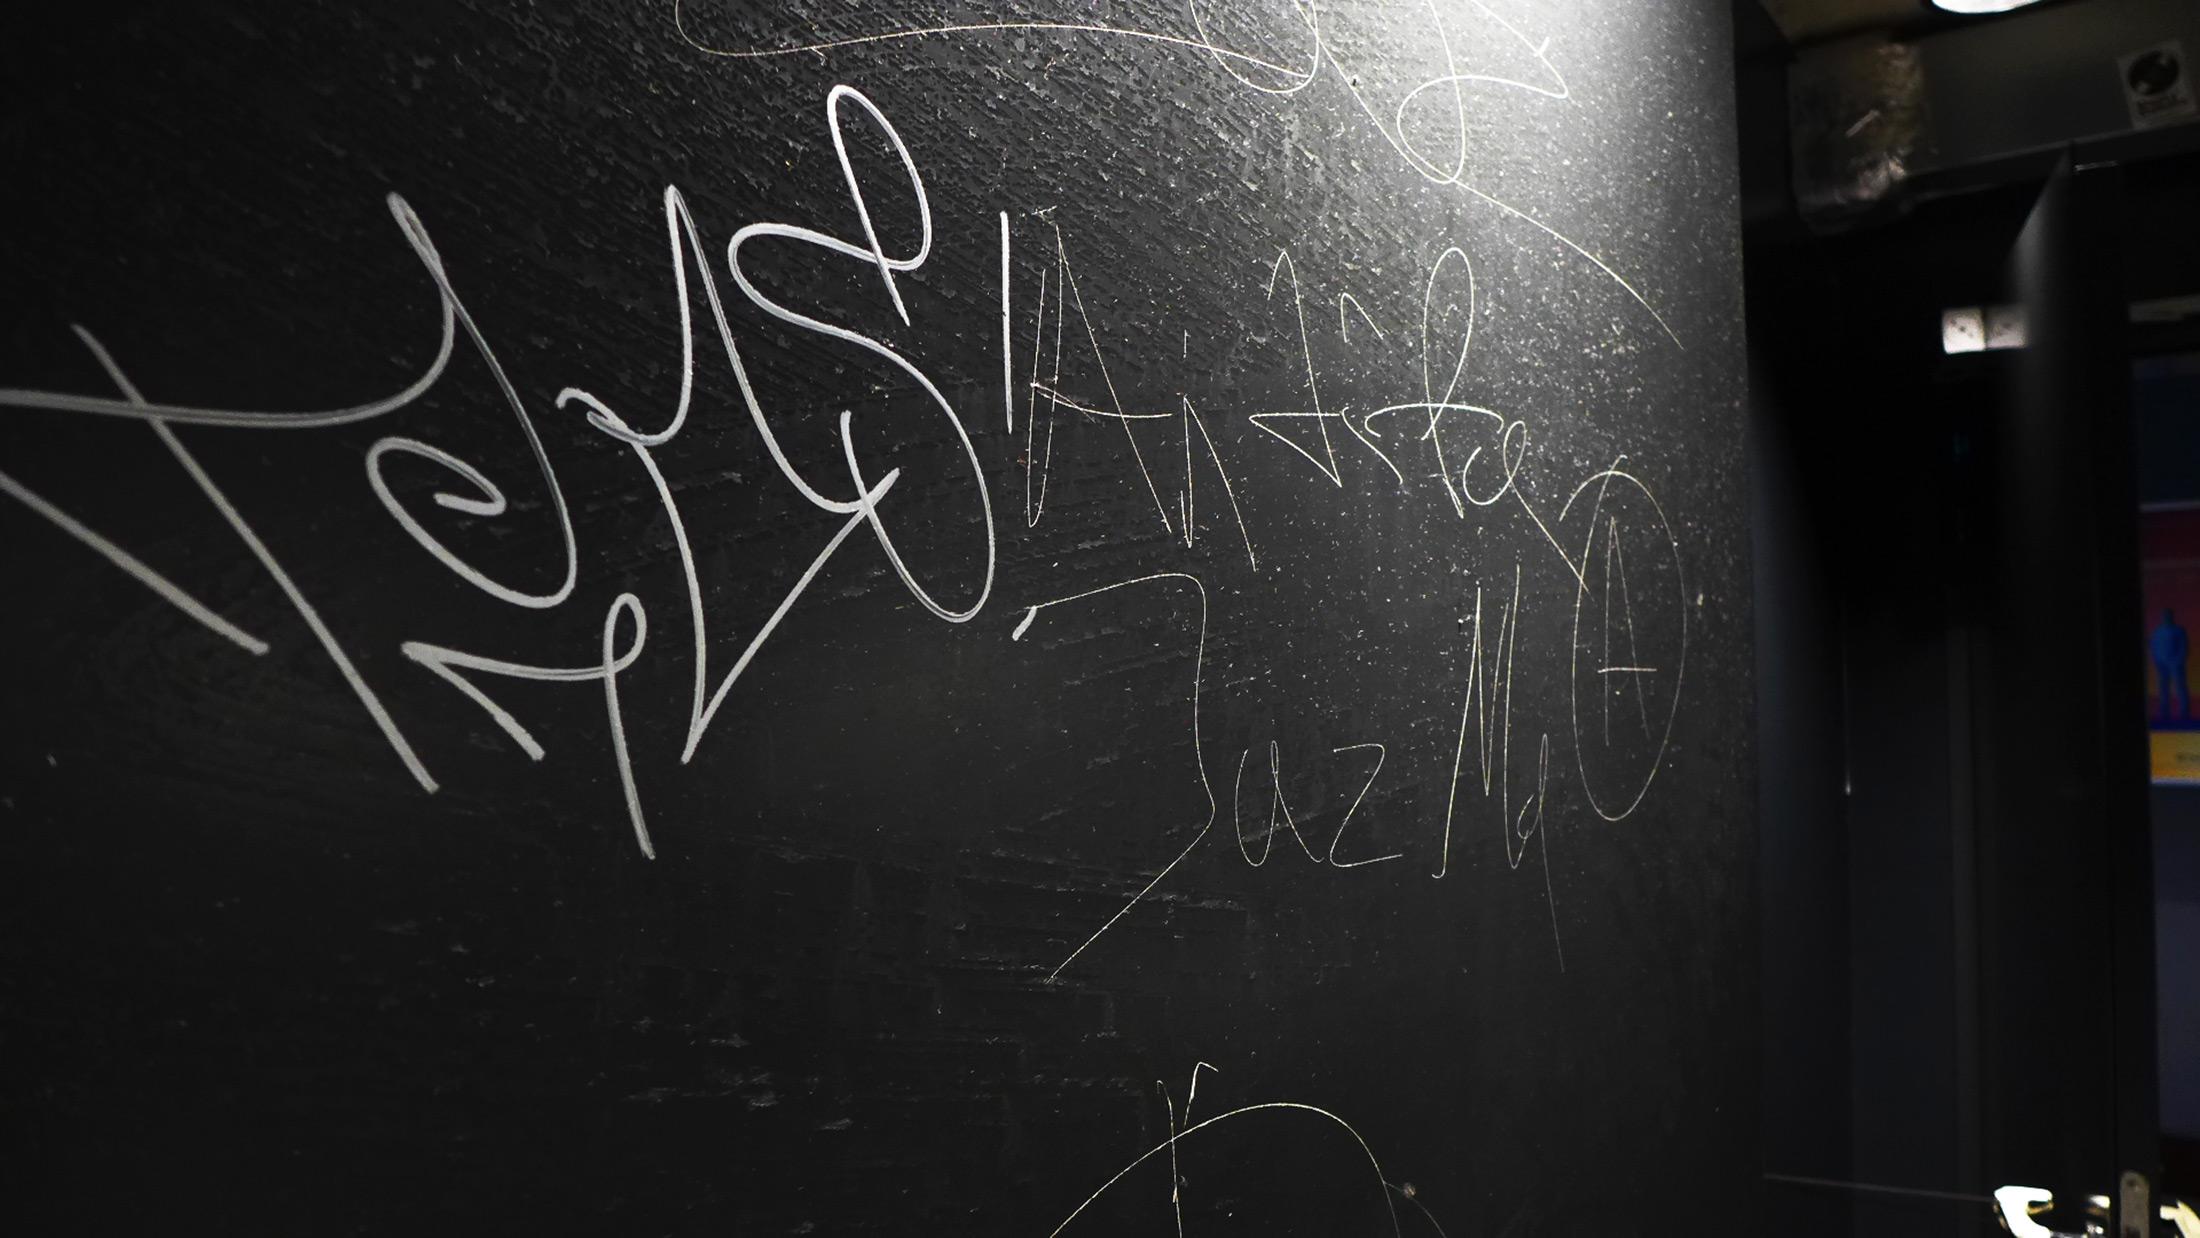 Graffity Schutz